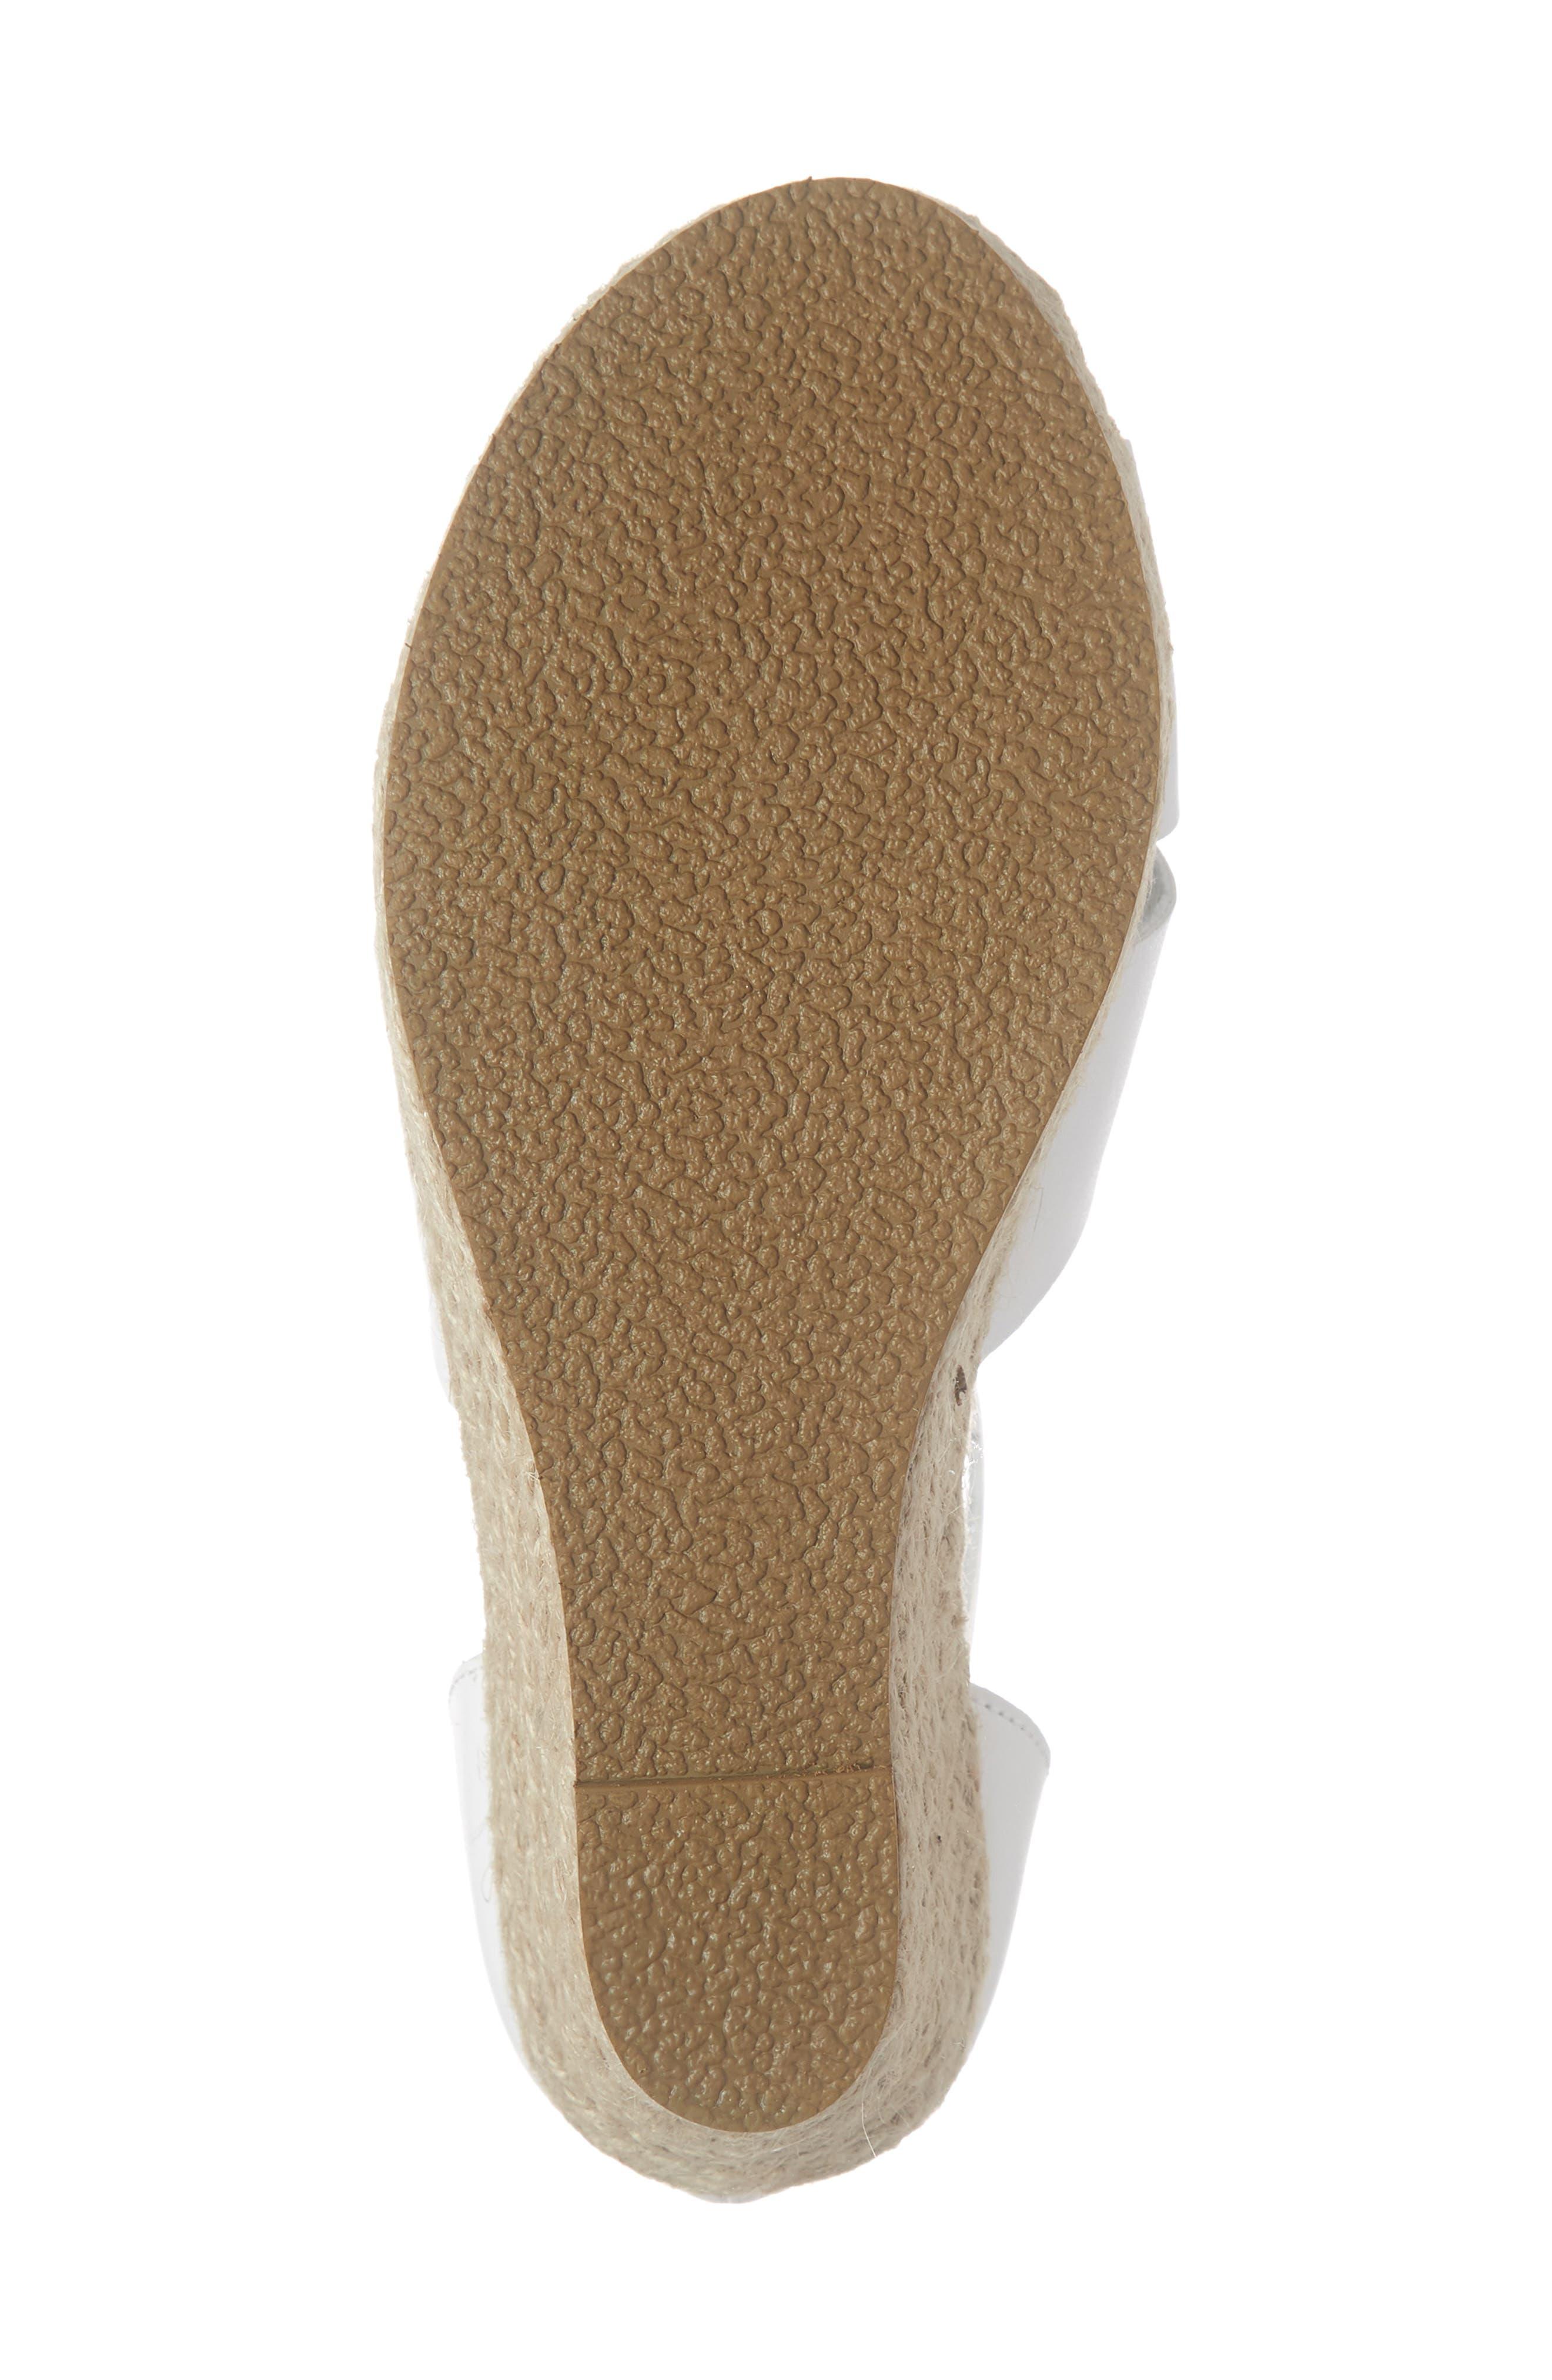 TREASURE & BOND, Espadrille Wedge Sandal, Alternate thumbnail 6, color, WHITE FAUX LEATHER